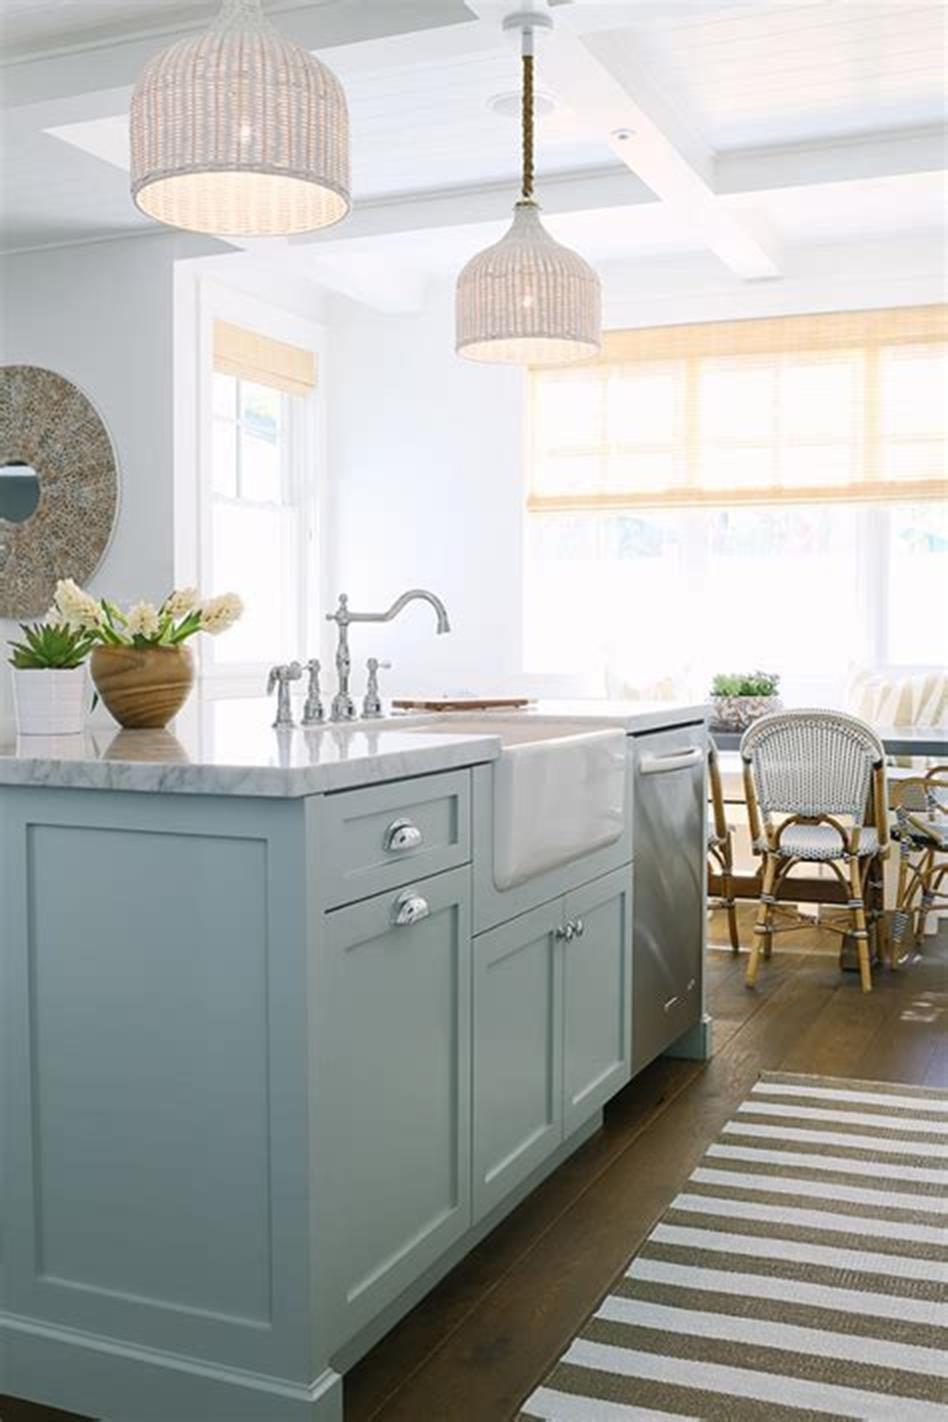 47 amazing coastal kitchen decor and design ideas coastal kitchen design kitchen island with on kitchen island ideas in small kitchen id=98128